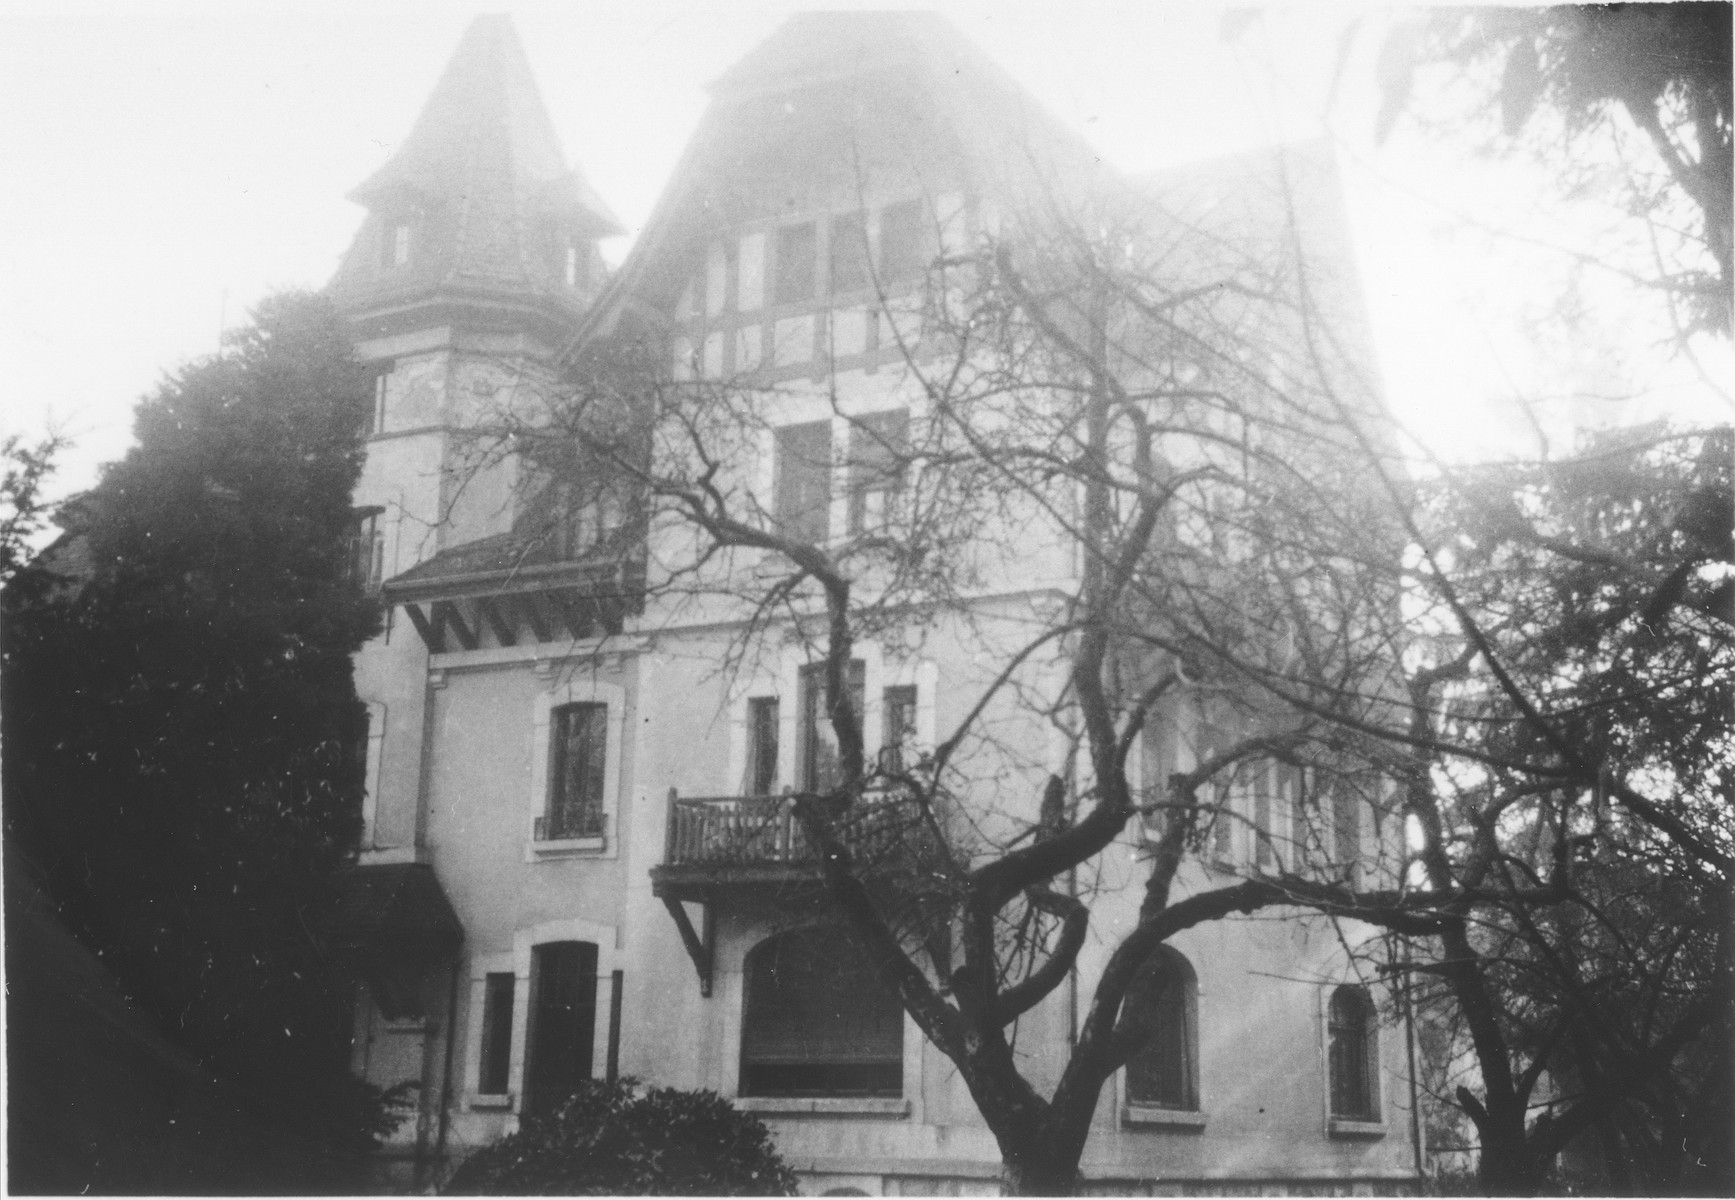 View of the Hôme de la Forêt children's home in Geneva, Switzerland.